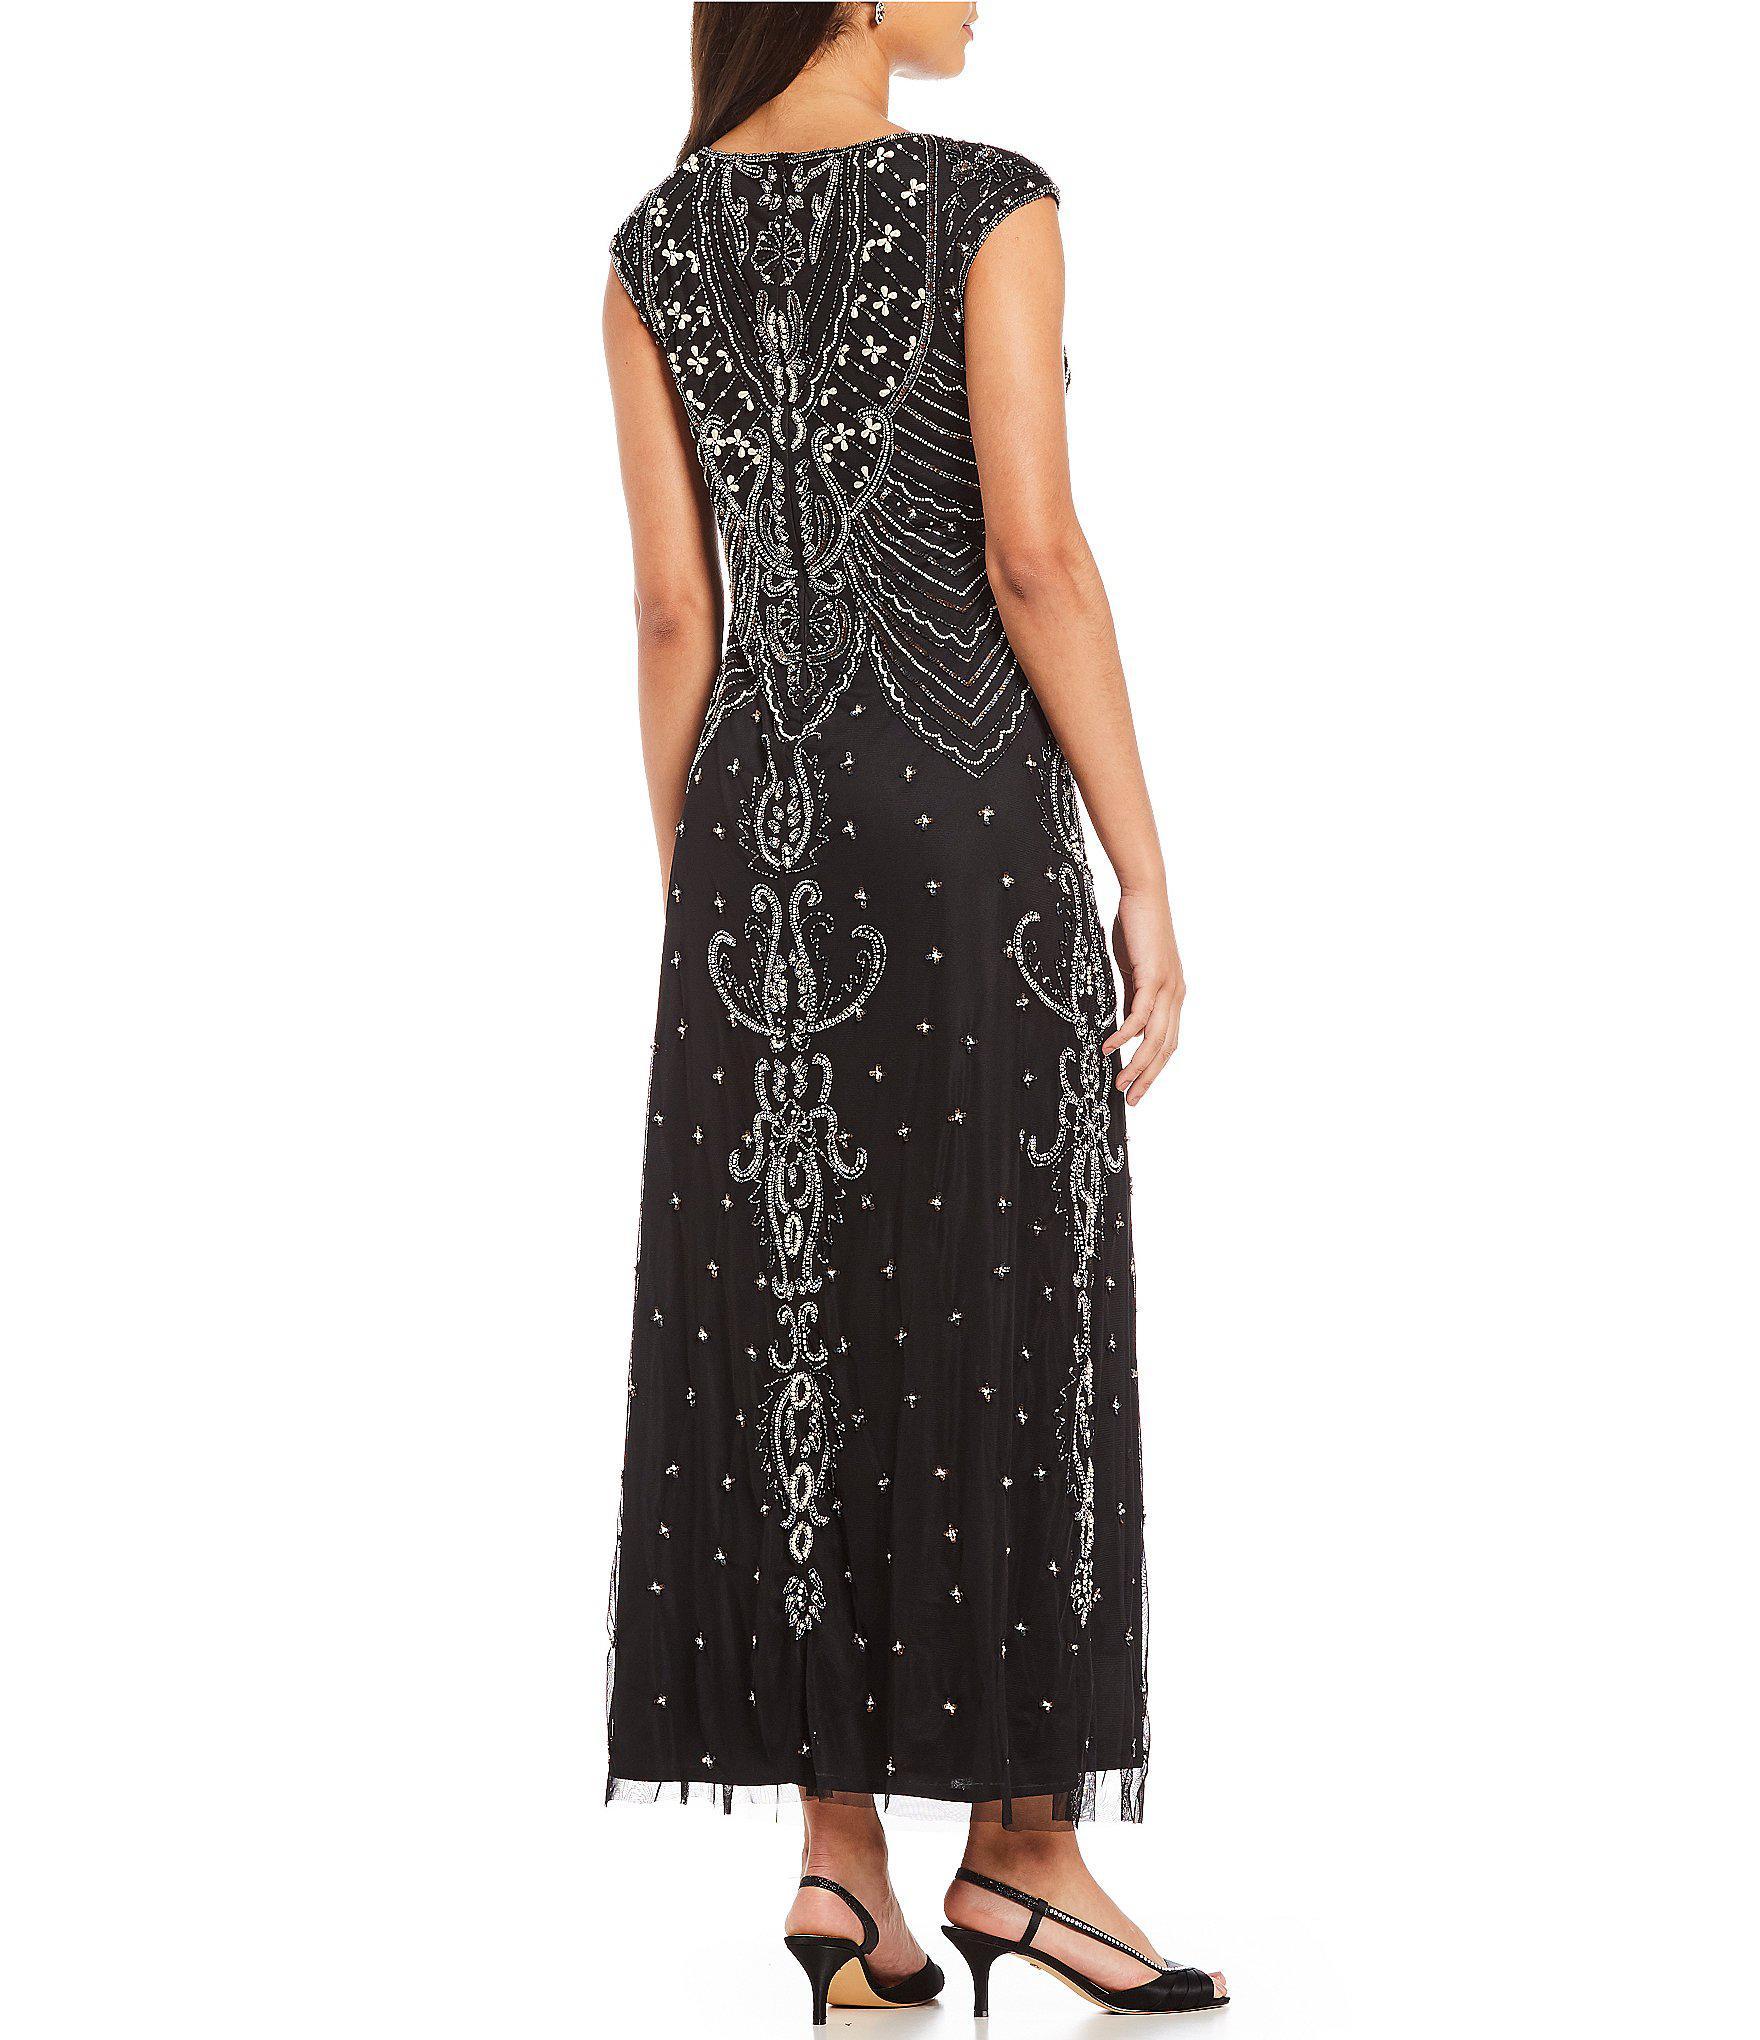 01852f81700 Pisarro Nights - Black Pearls And Beads Cap Sleeve Gown - Lyst. View  fullscreen